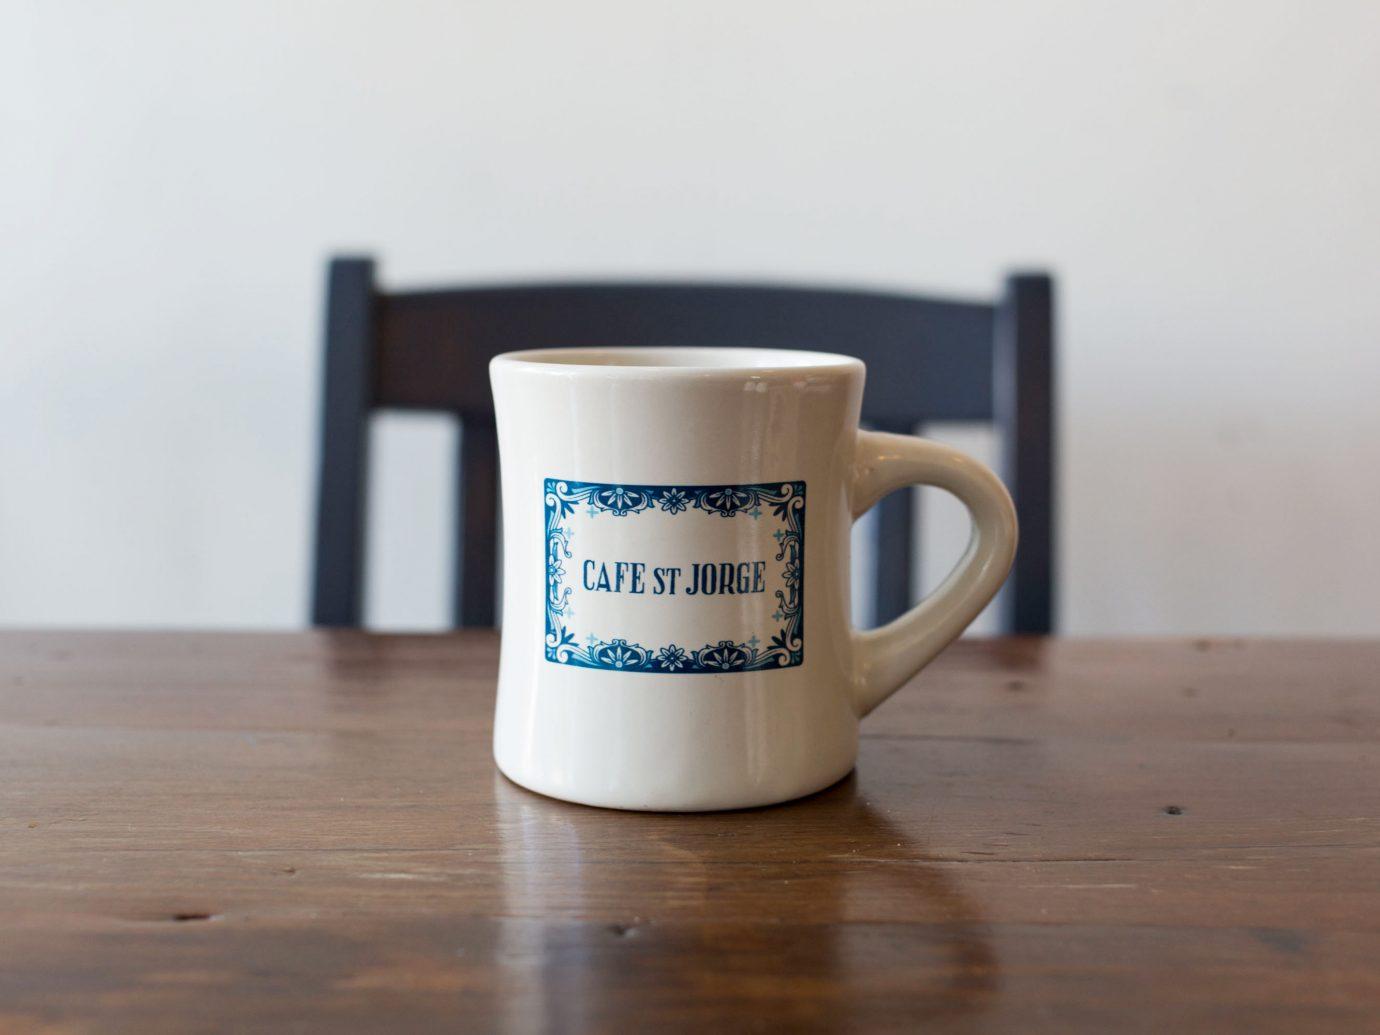 Food + Drink cup coffee table indoor mug floor coffee cup Drink drinkware wooden caffeine ceramic espresso tableware